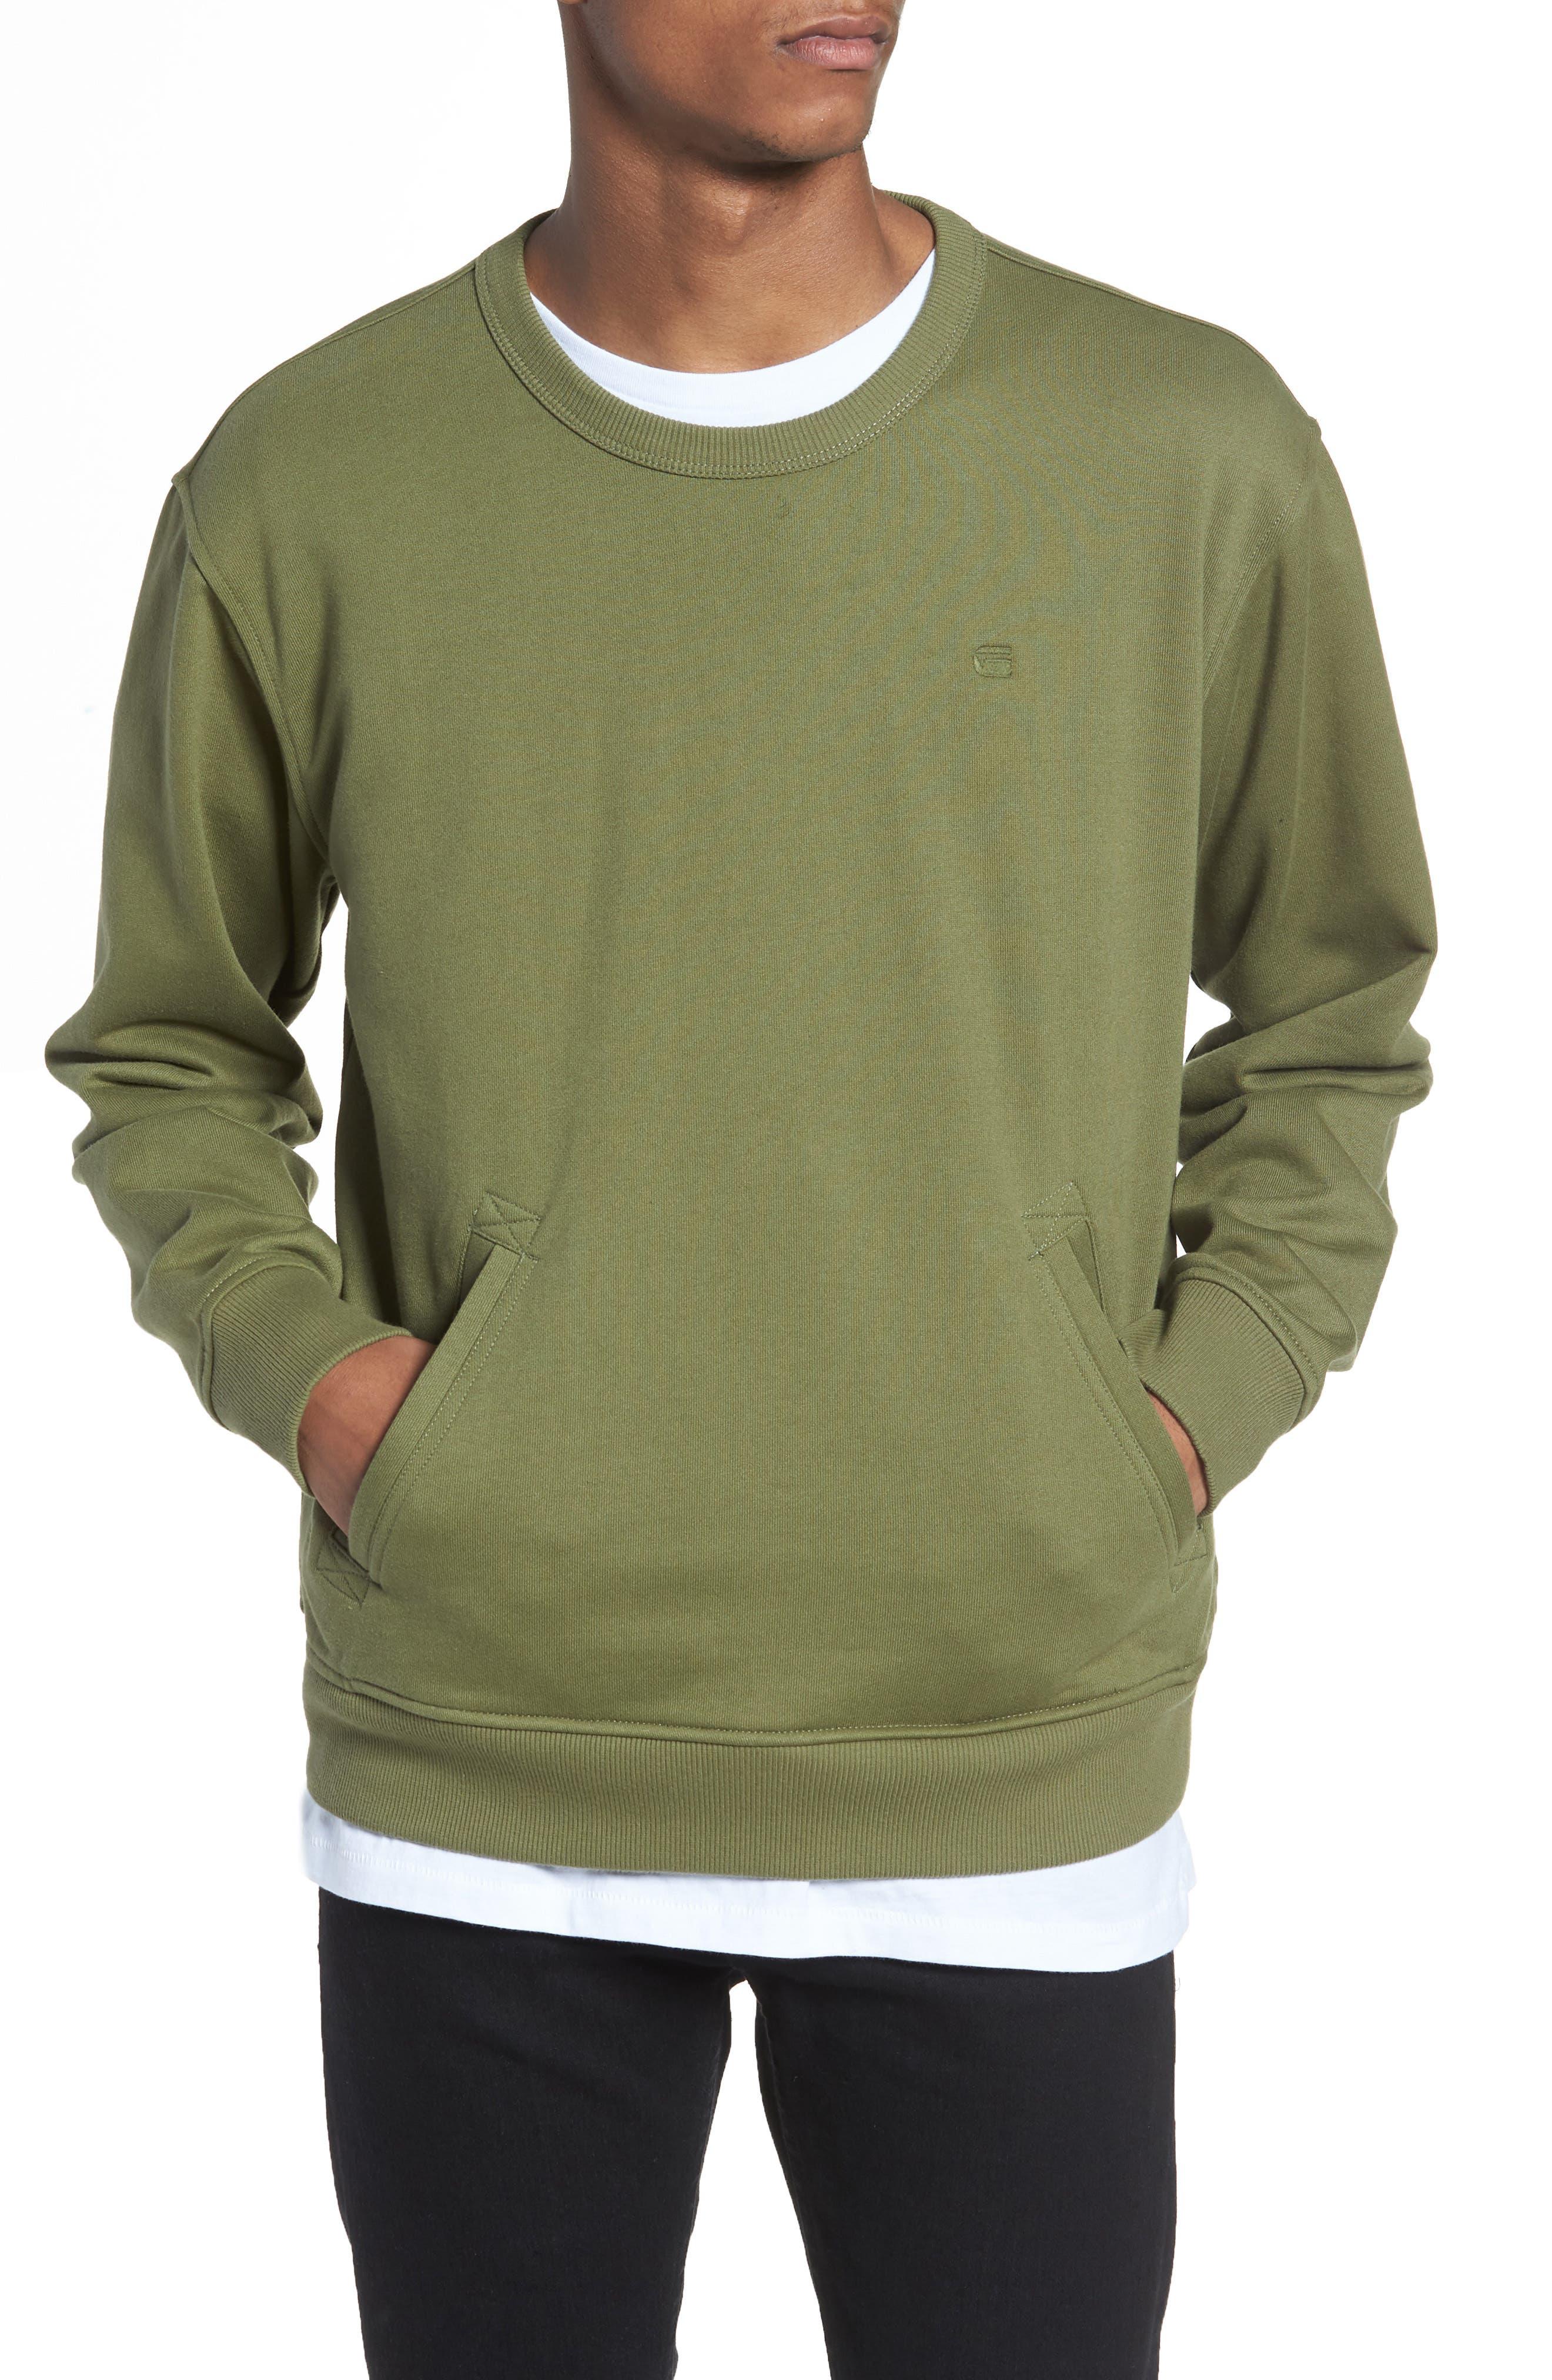 Core Hybrid Archive Sweatshirt,                             Main thumbnail 1, color,                             300